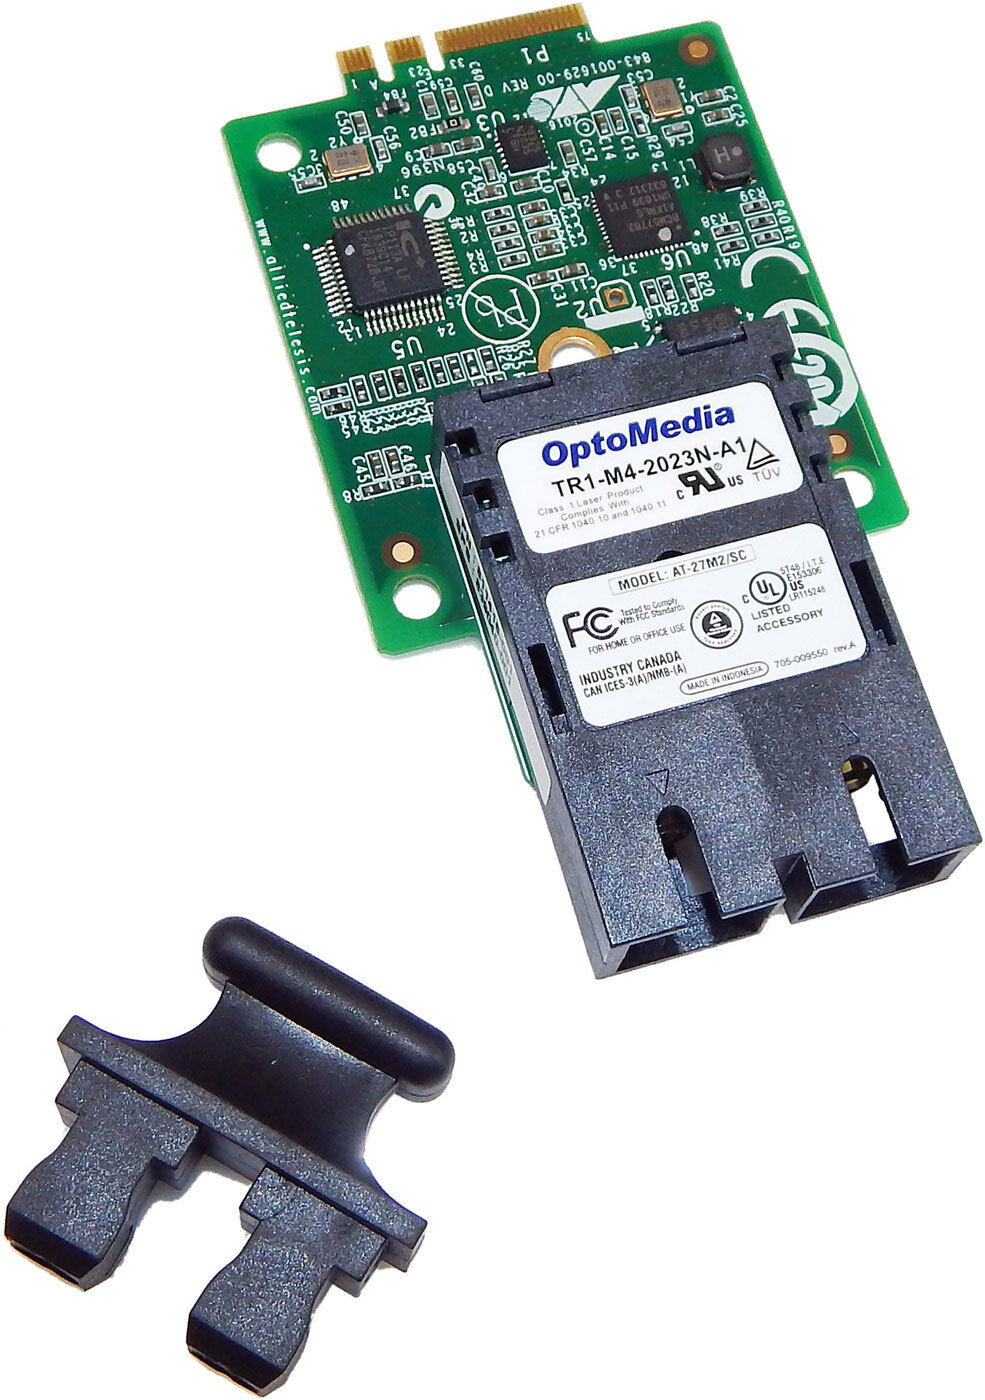 HP t730 t630 AT-27M2/SC-001 Ethernet Fiber 839040-001 811416-001